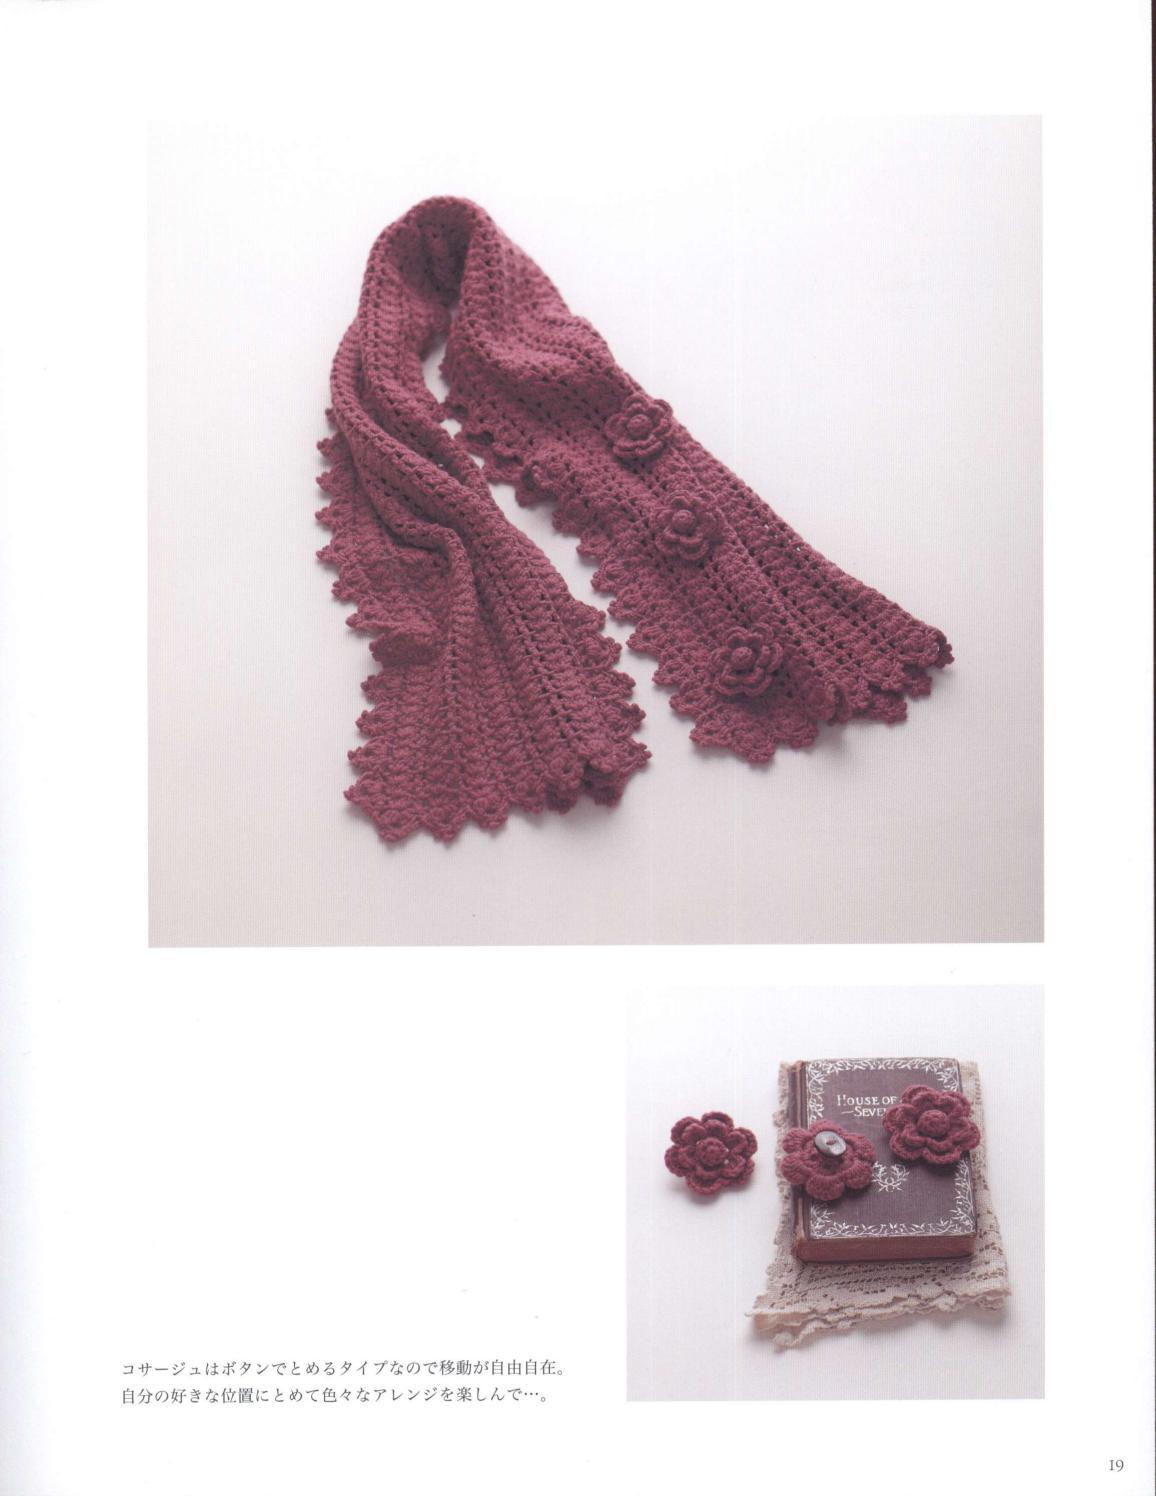 Asahi original crochet best selection 2012 page 19